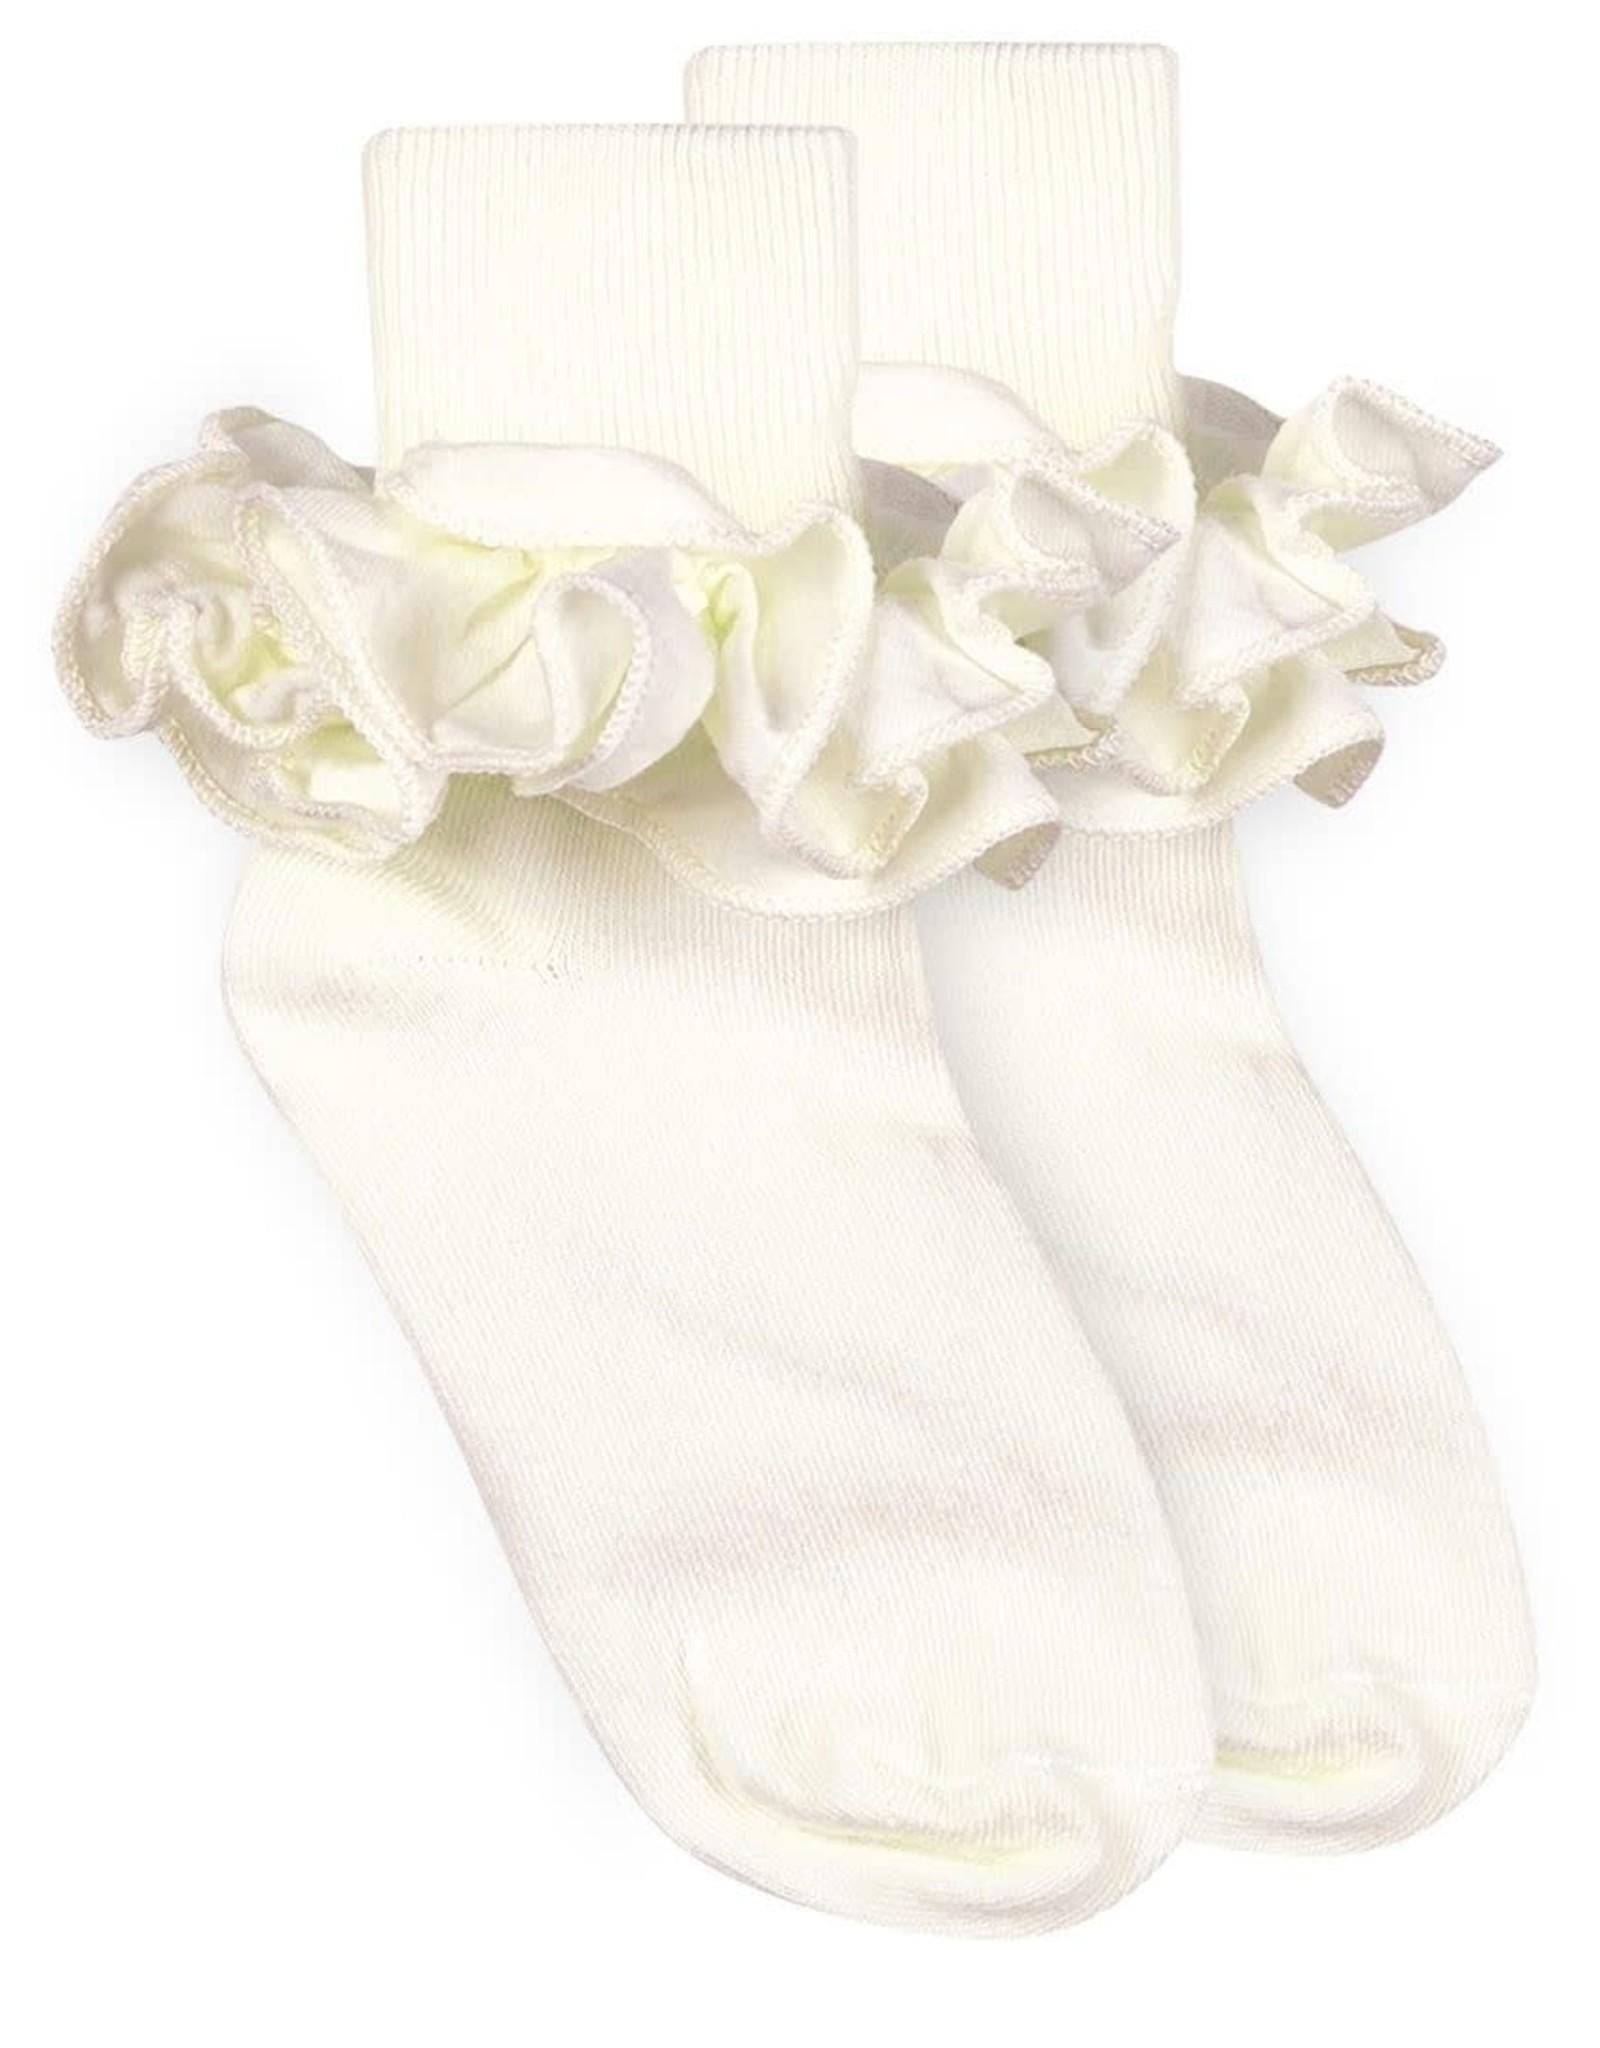 Jefferies Socks Ivory Ruffle Socks